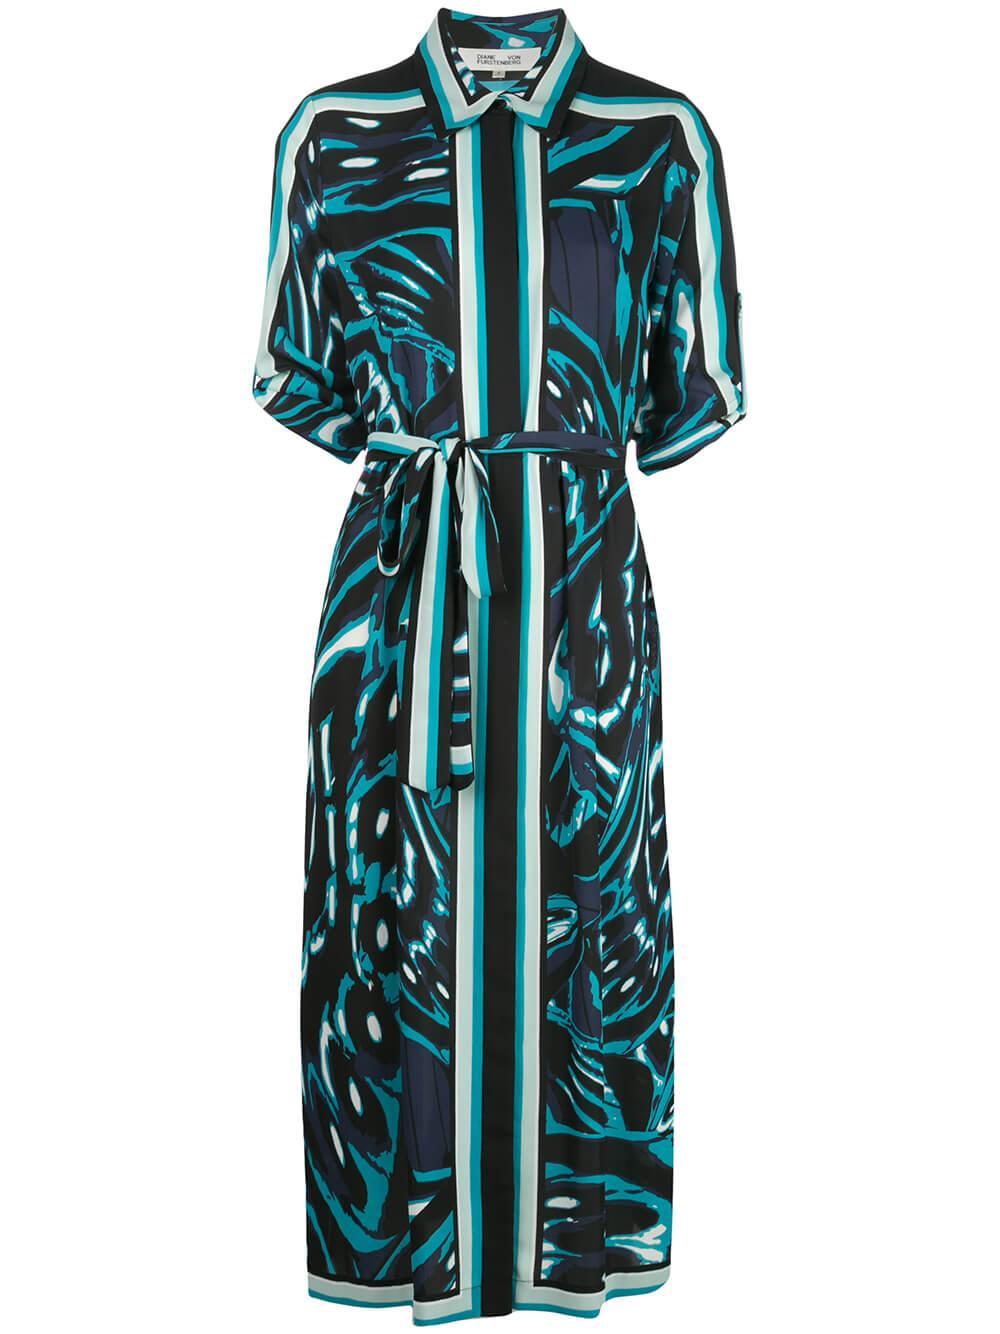 Sogol Belted Midi Dress Item # 13886DVF